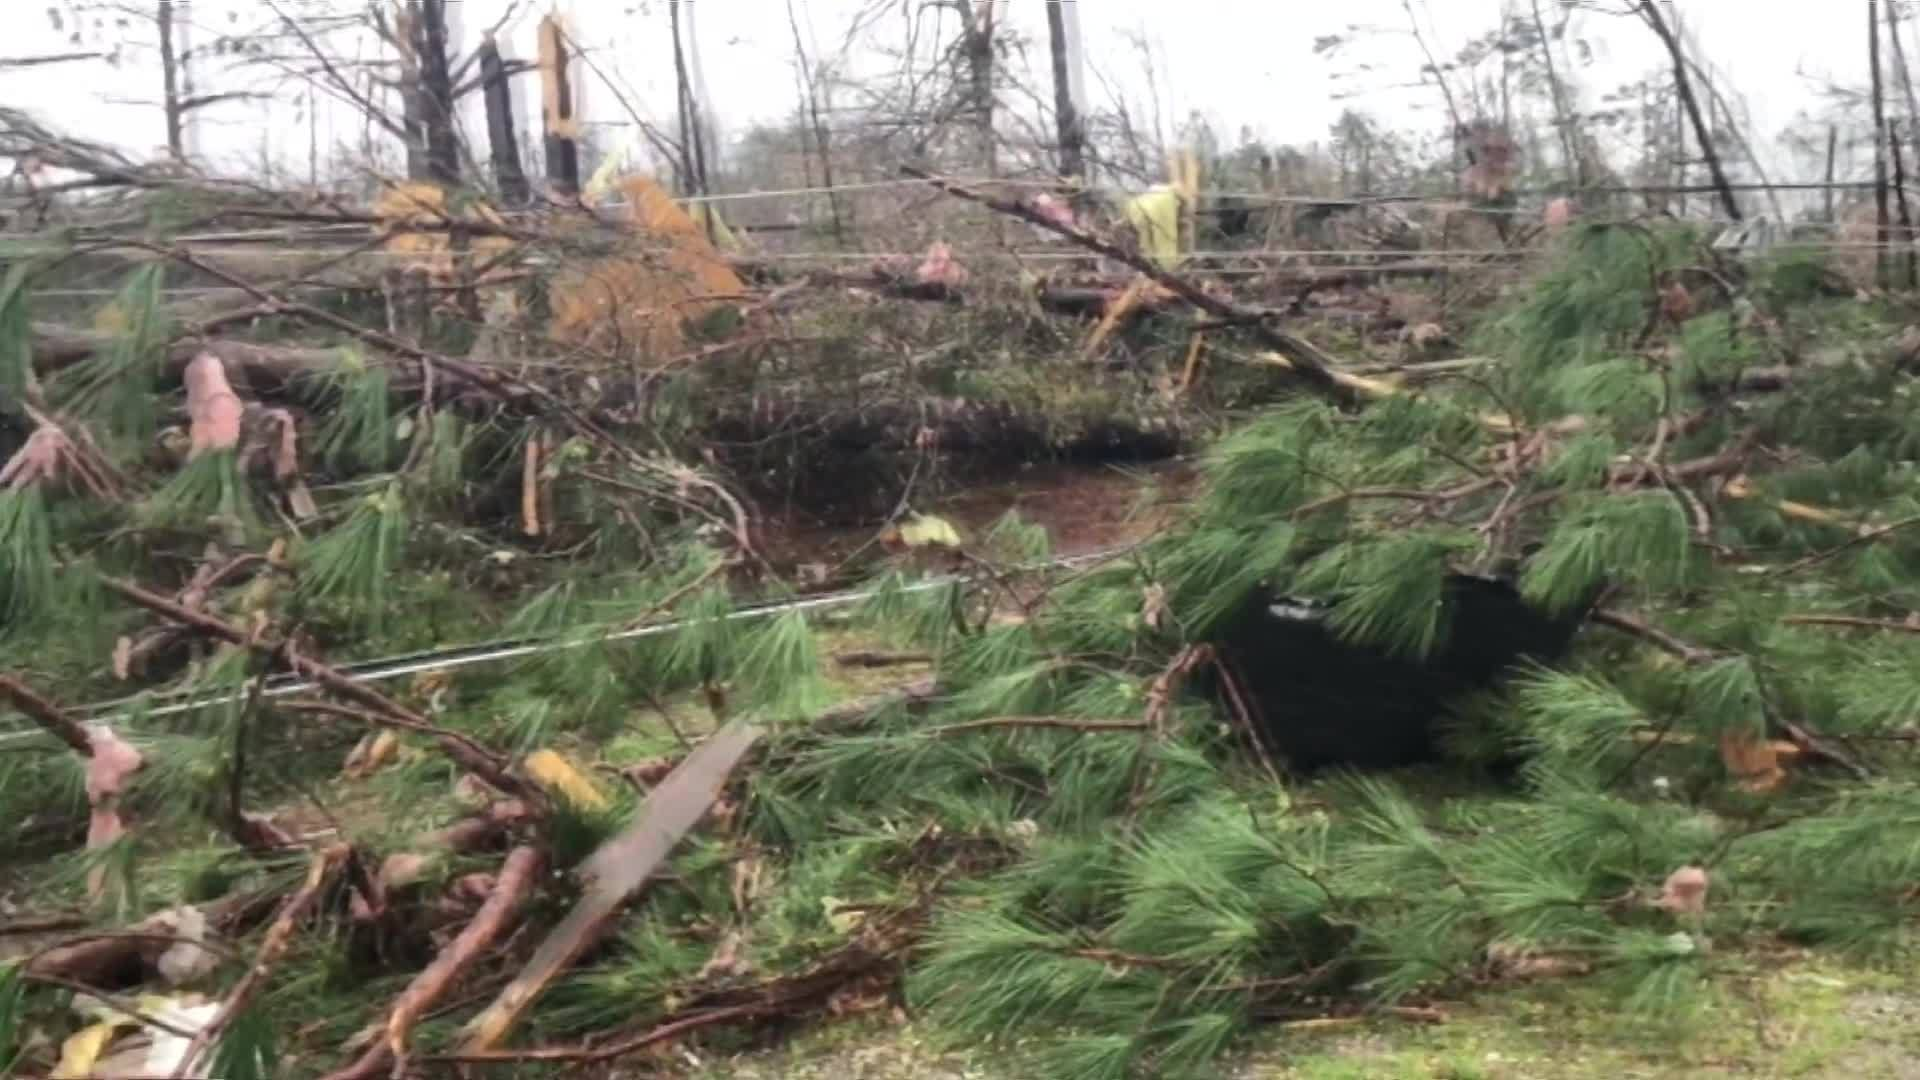 At least 14 people dead in Lee County following tornado